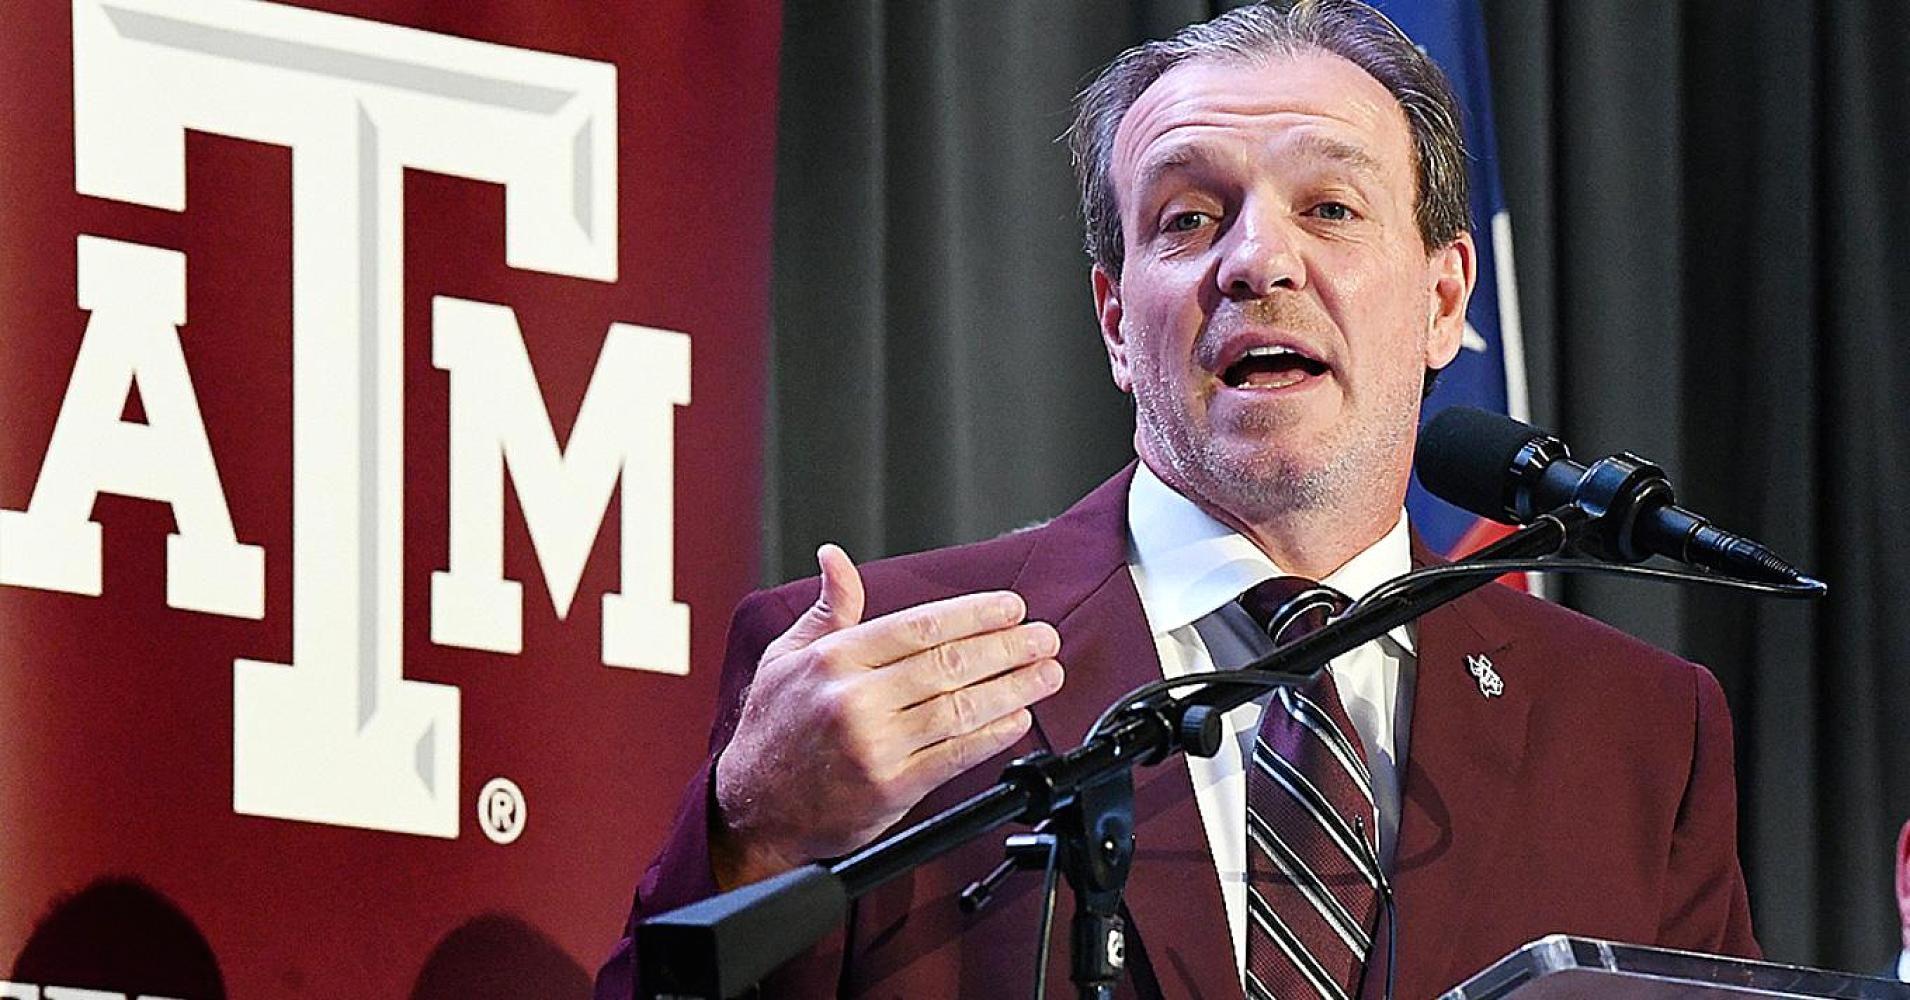 College or university coaches' salaries increase despite